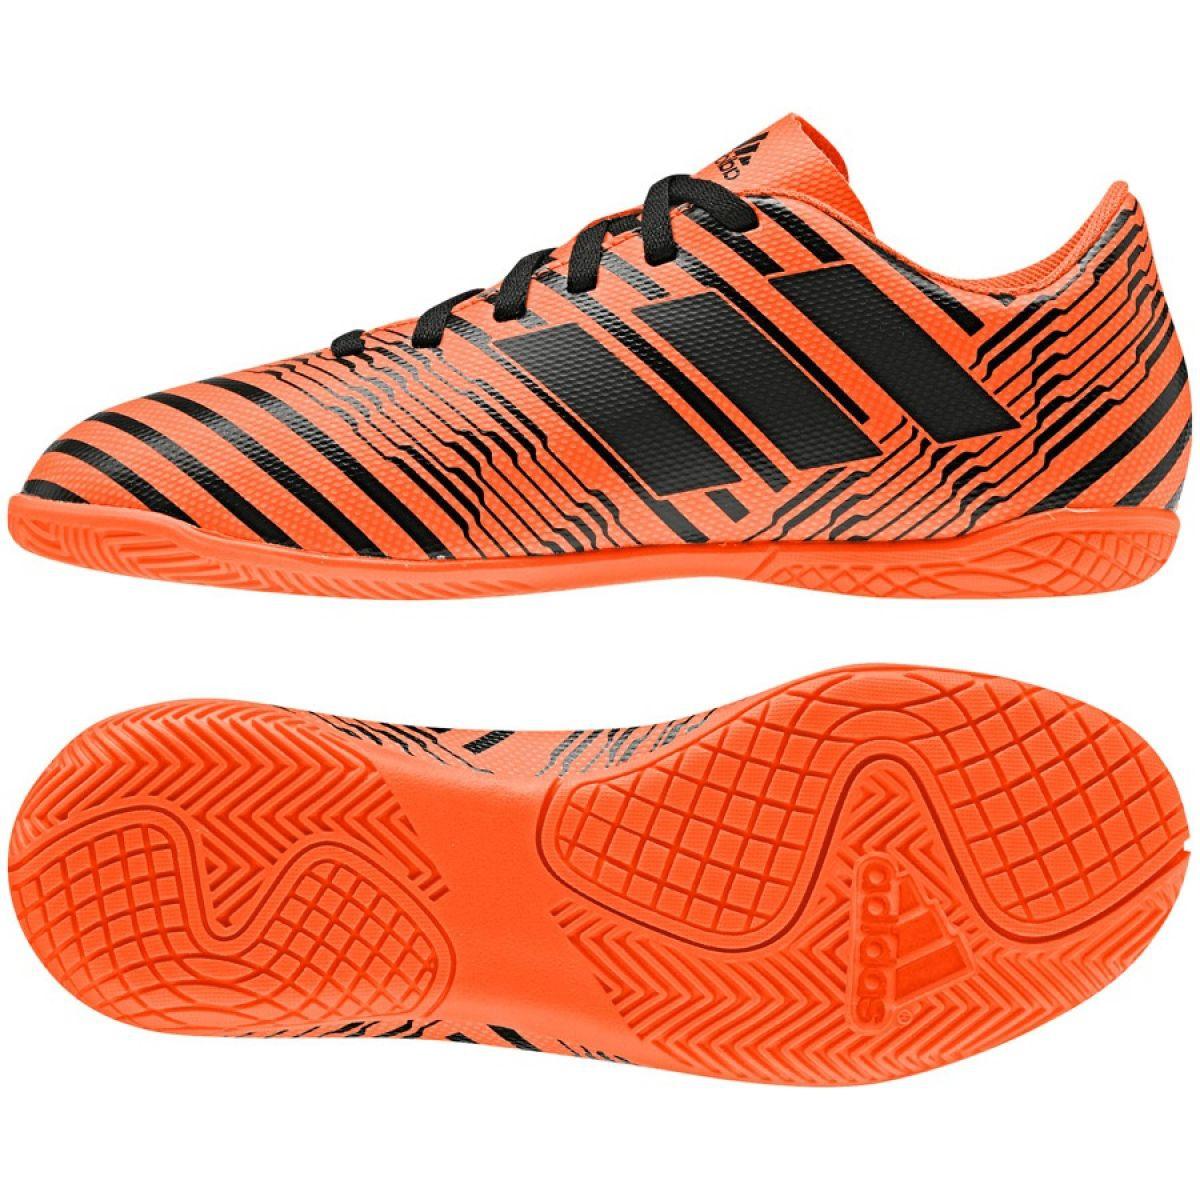 Inomhusskor adidas Nemeziz 17.4 I Jr S82467 apelsin apelsin